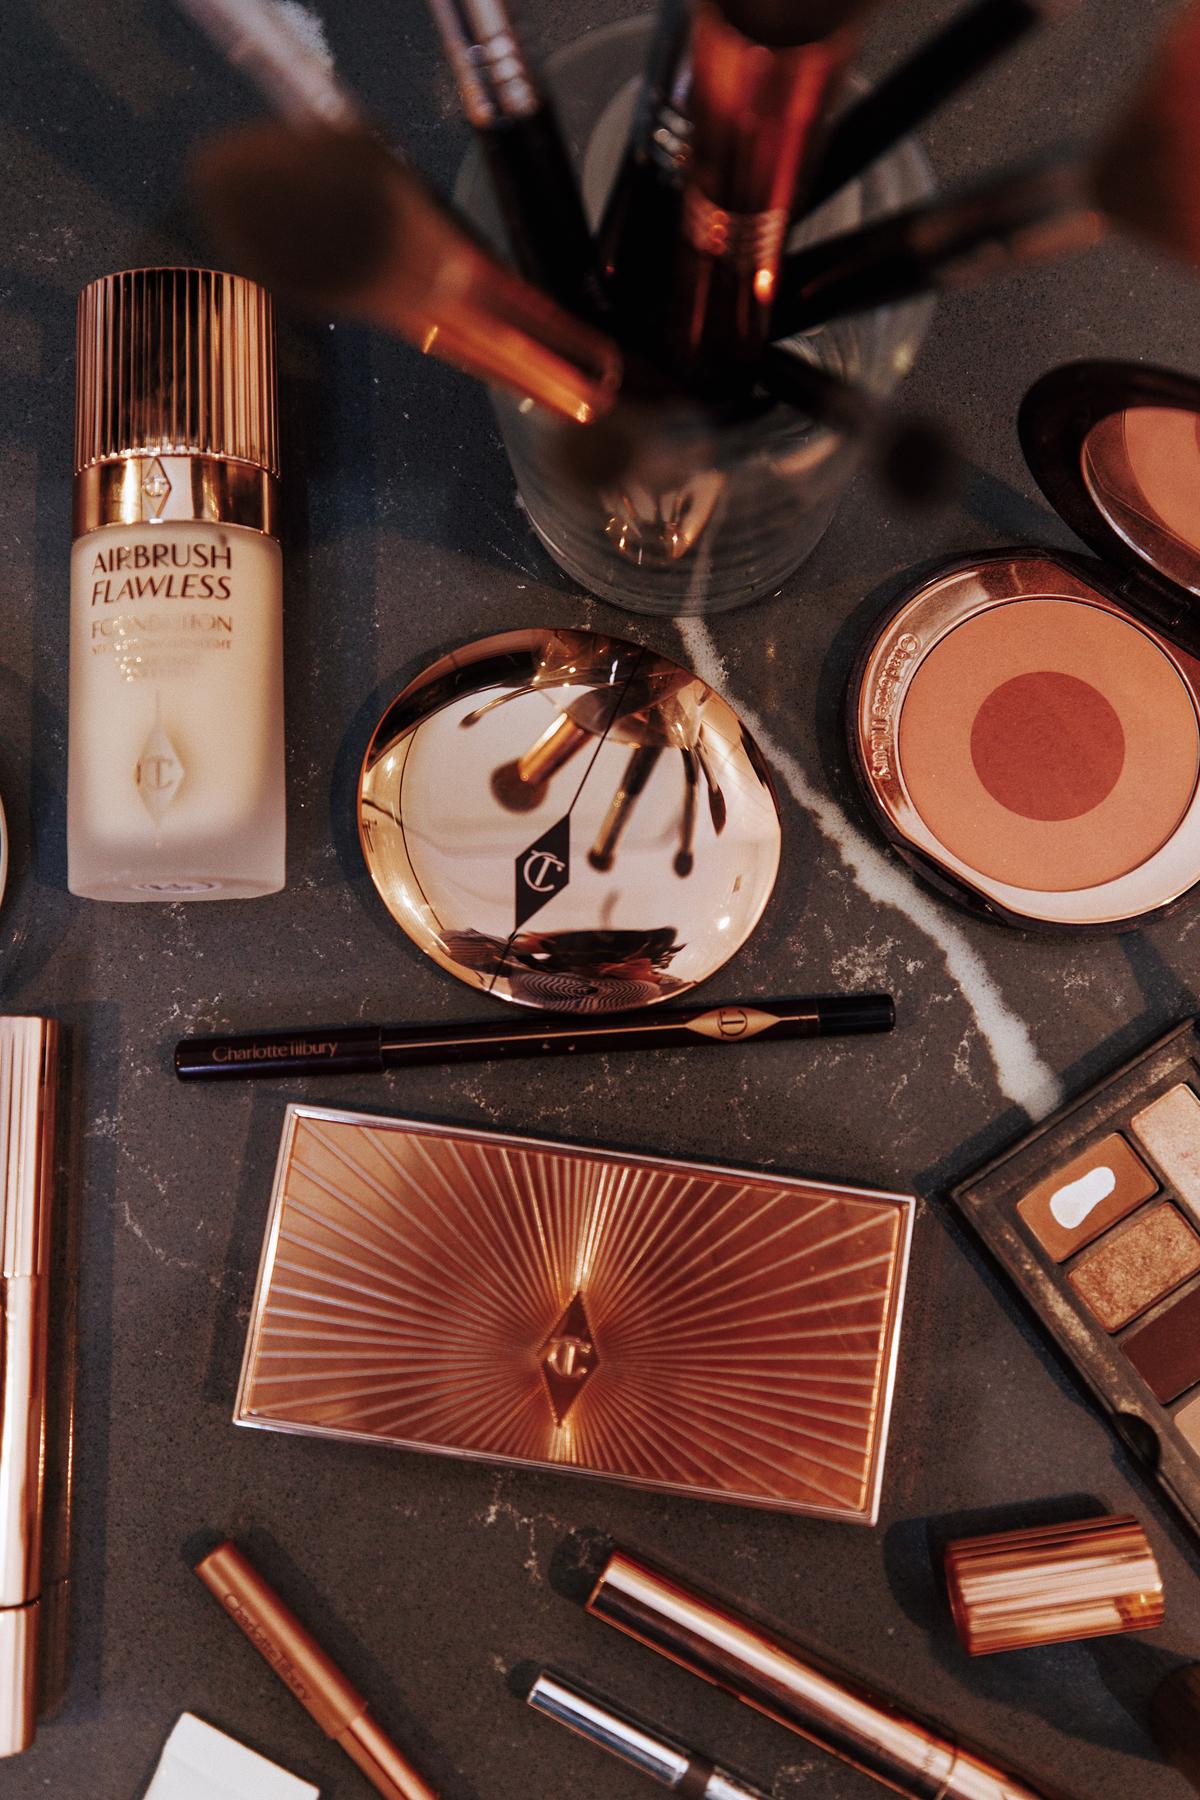 fashion jackson sephora holiday beauty event 2019 charlotte tilbury makeup